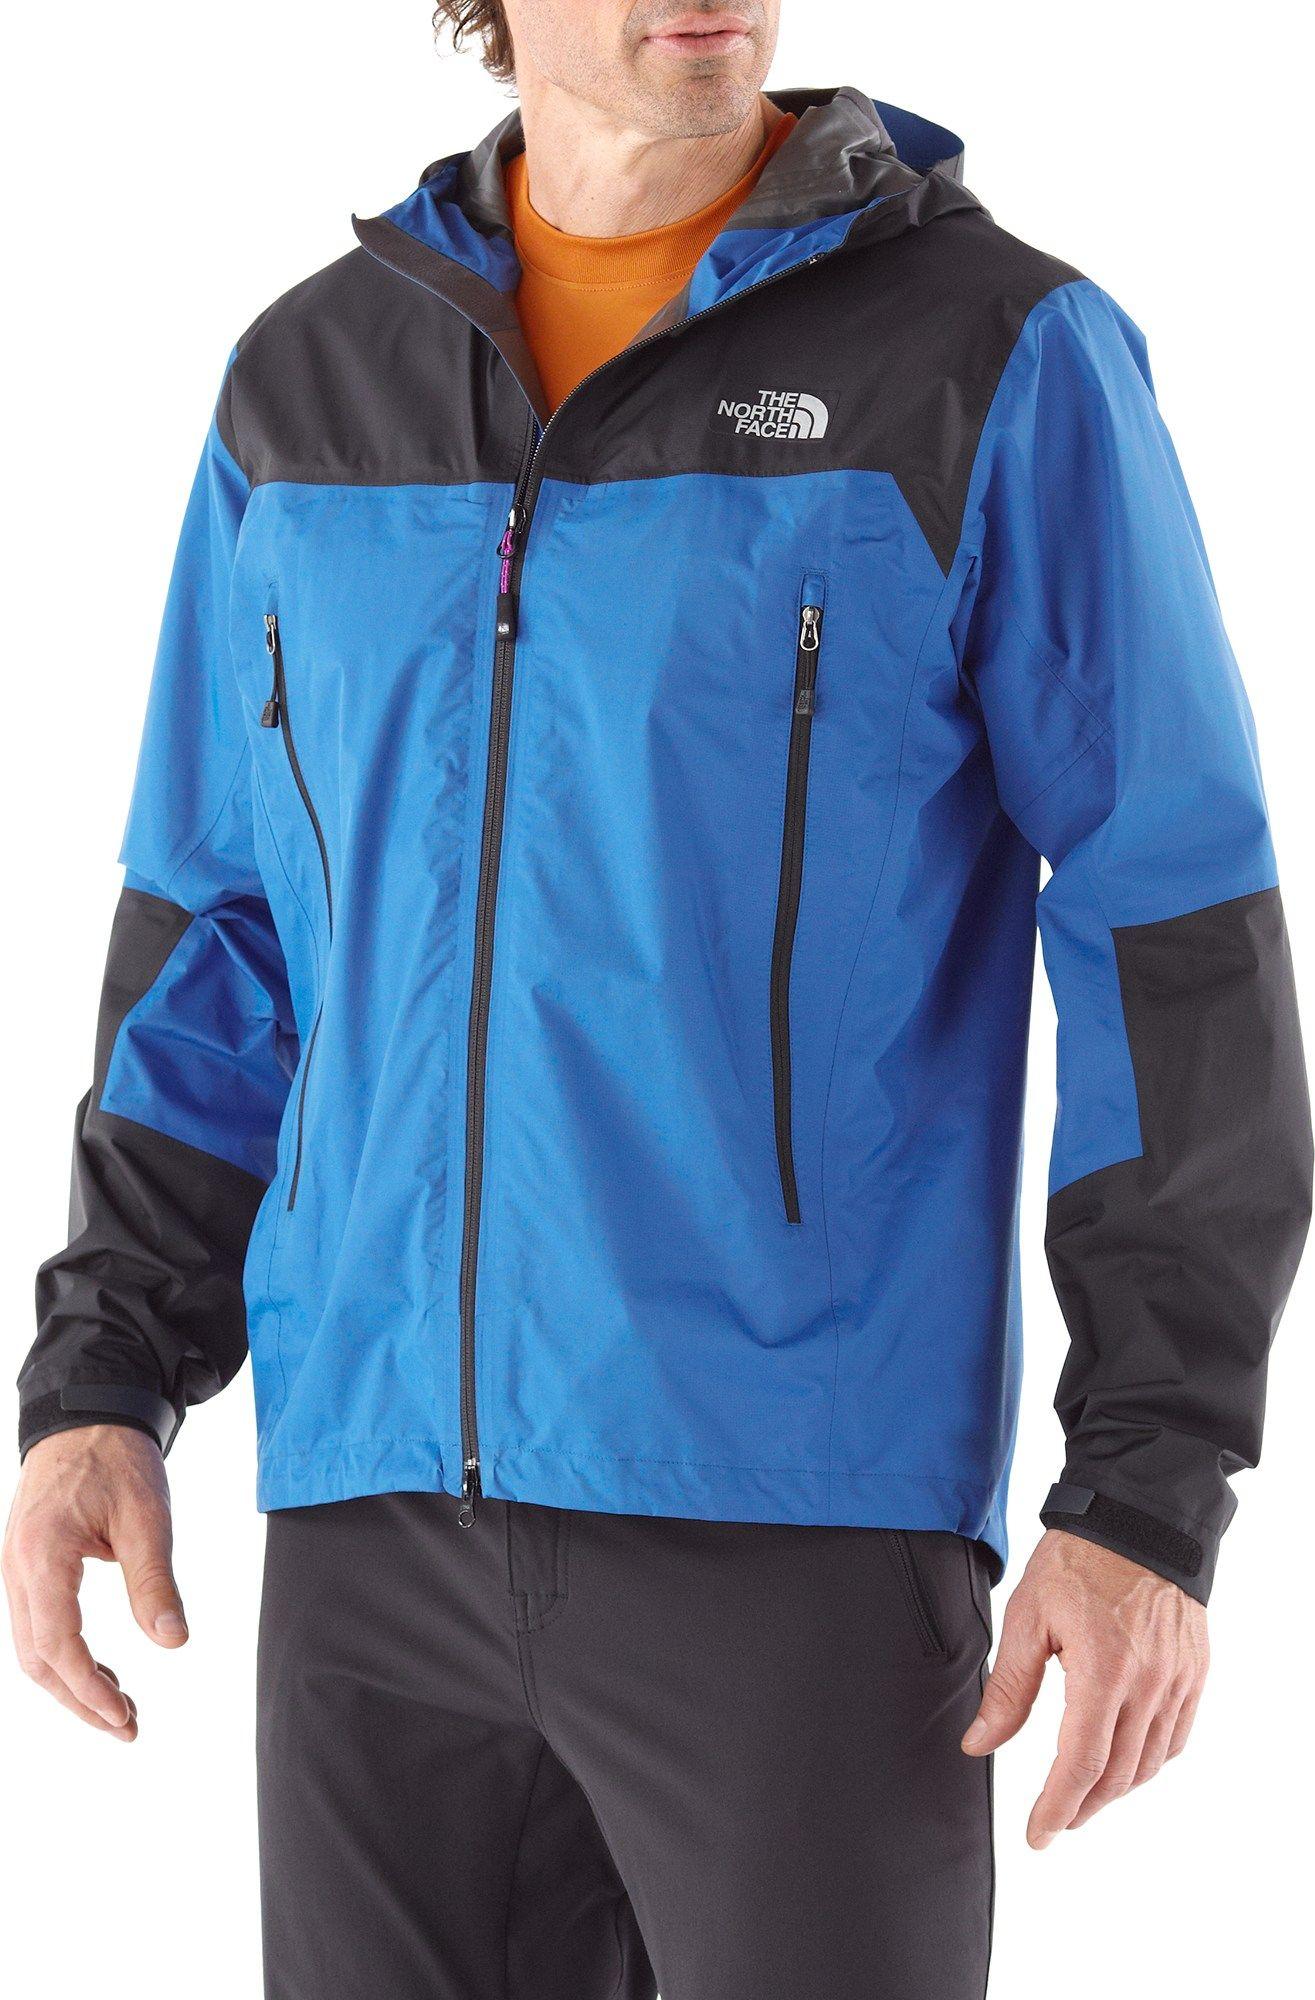 The North Face Meru Paclite Jacket Men S Rei Co Op Designer Clothes For Men Mens Jackets Jackets [ 2000 x 1315 Pixel ]